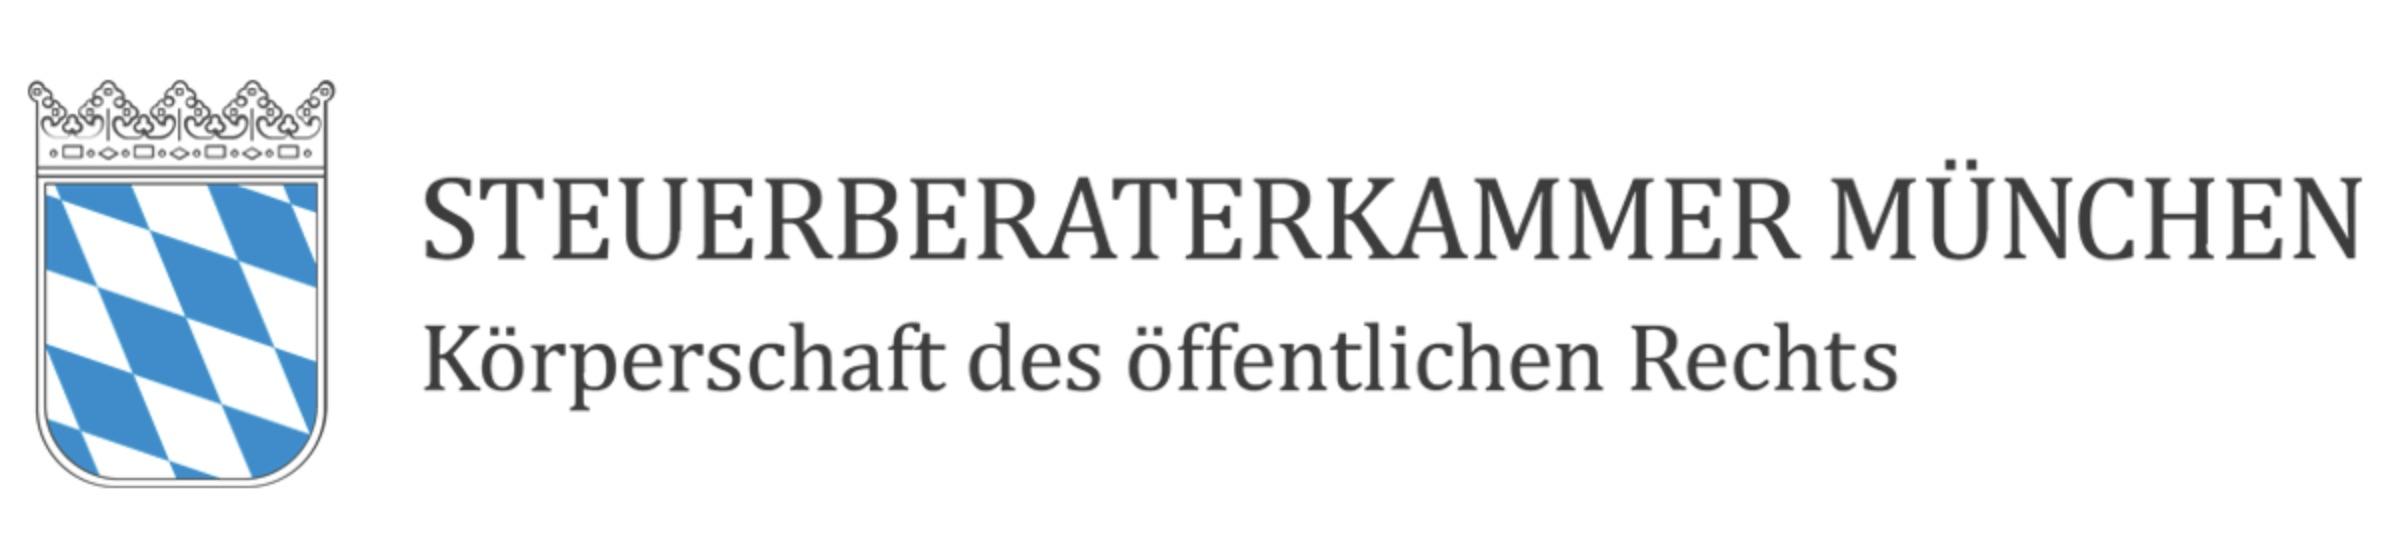 steuerberaterkammer-logo